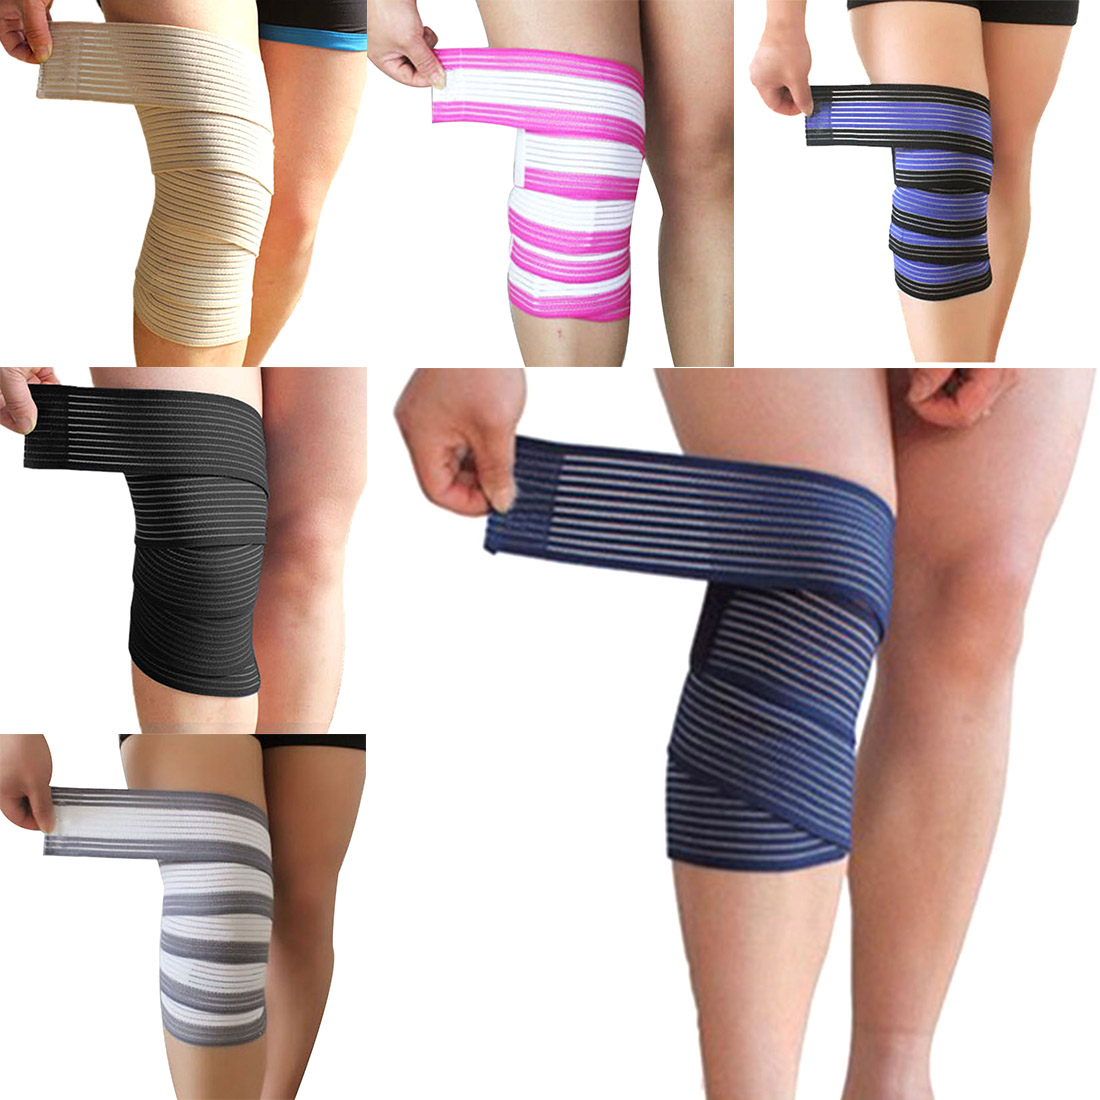 2018 NEW 1PCS 120*7.5cm Powerlifting Elastic Bandage Leg Compression Calf Knee Support Strap Wraps Band Brace Sports Safety